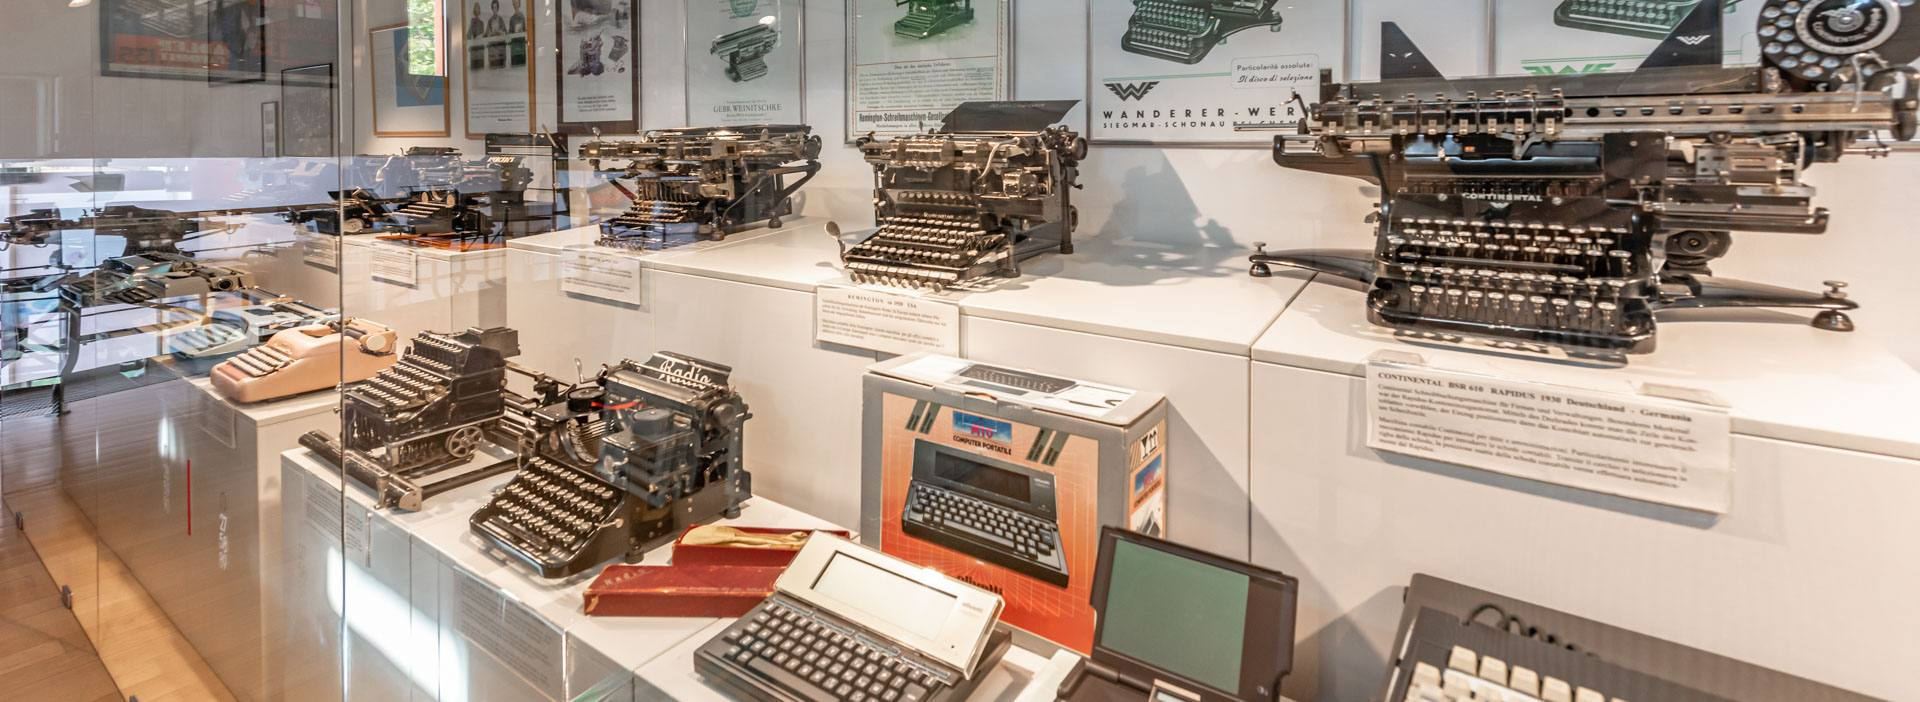 Schreibmaschinenmuseum Peter Mitterhofer